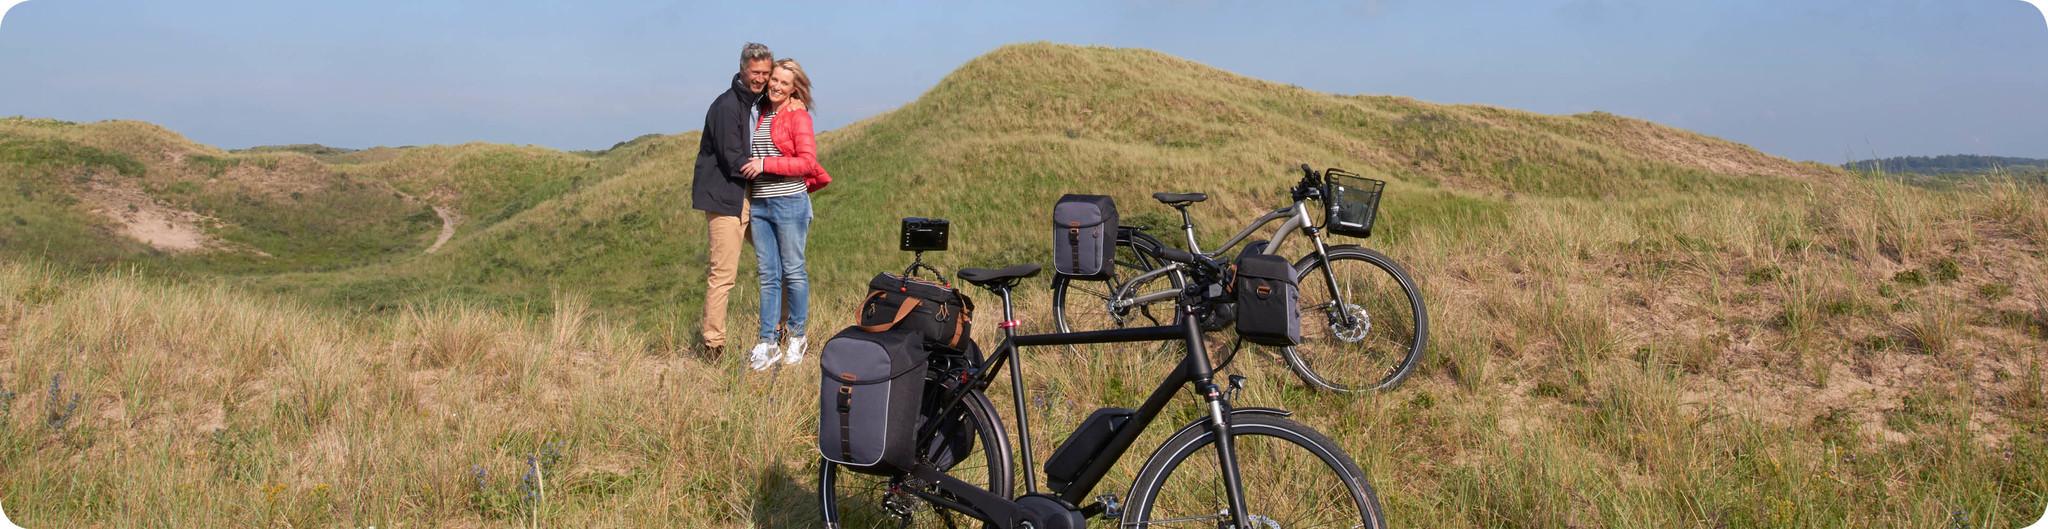 Sommerurlaub 2020: Slow Travelling wird von Corona angekurbelt